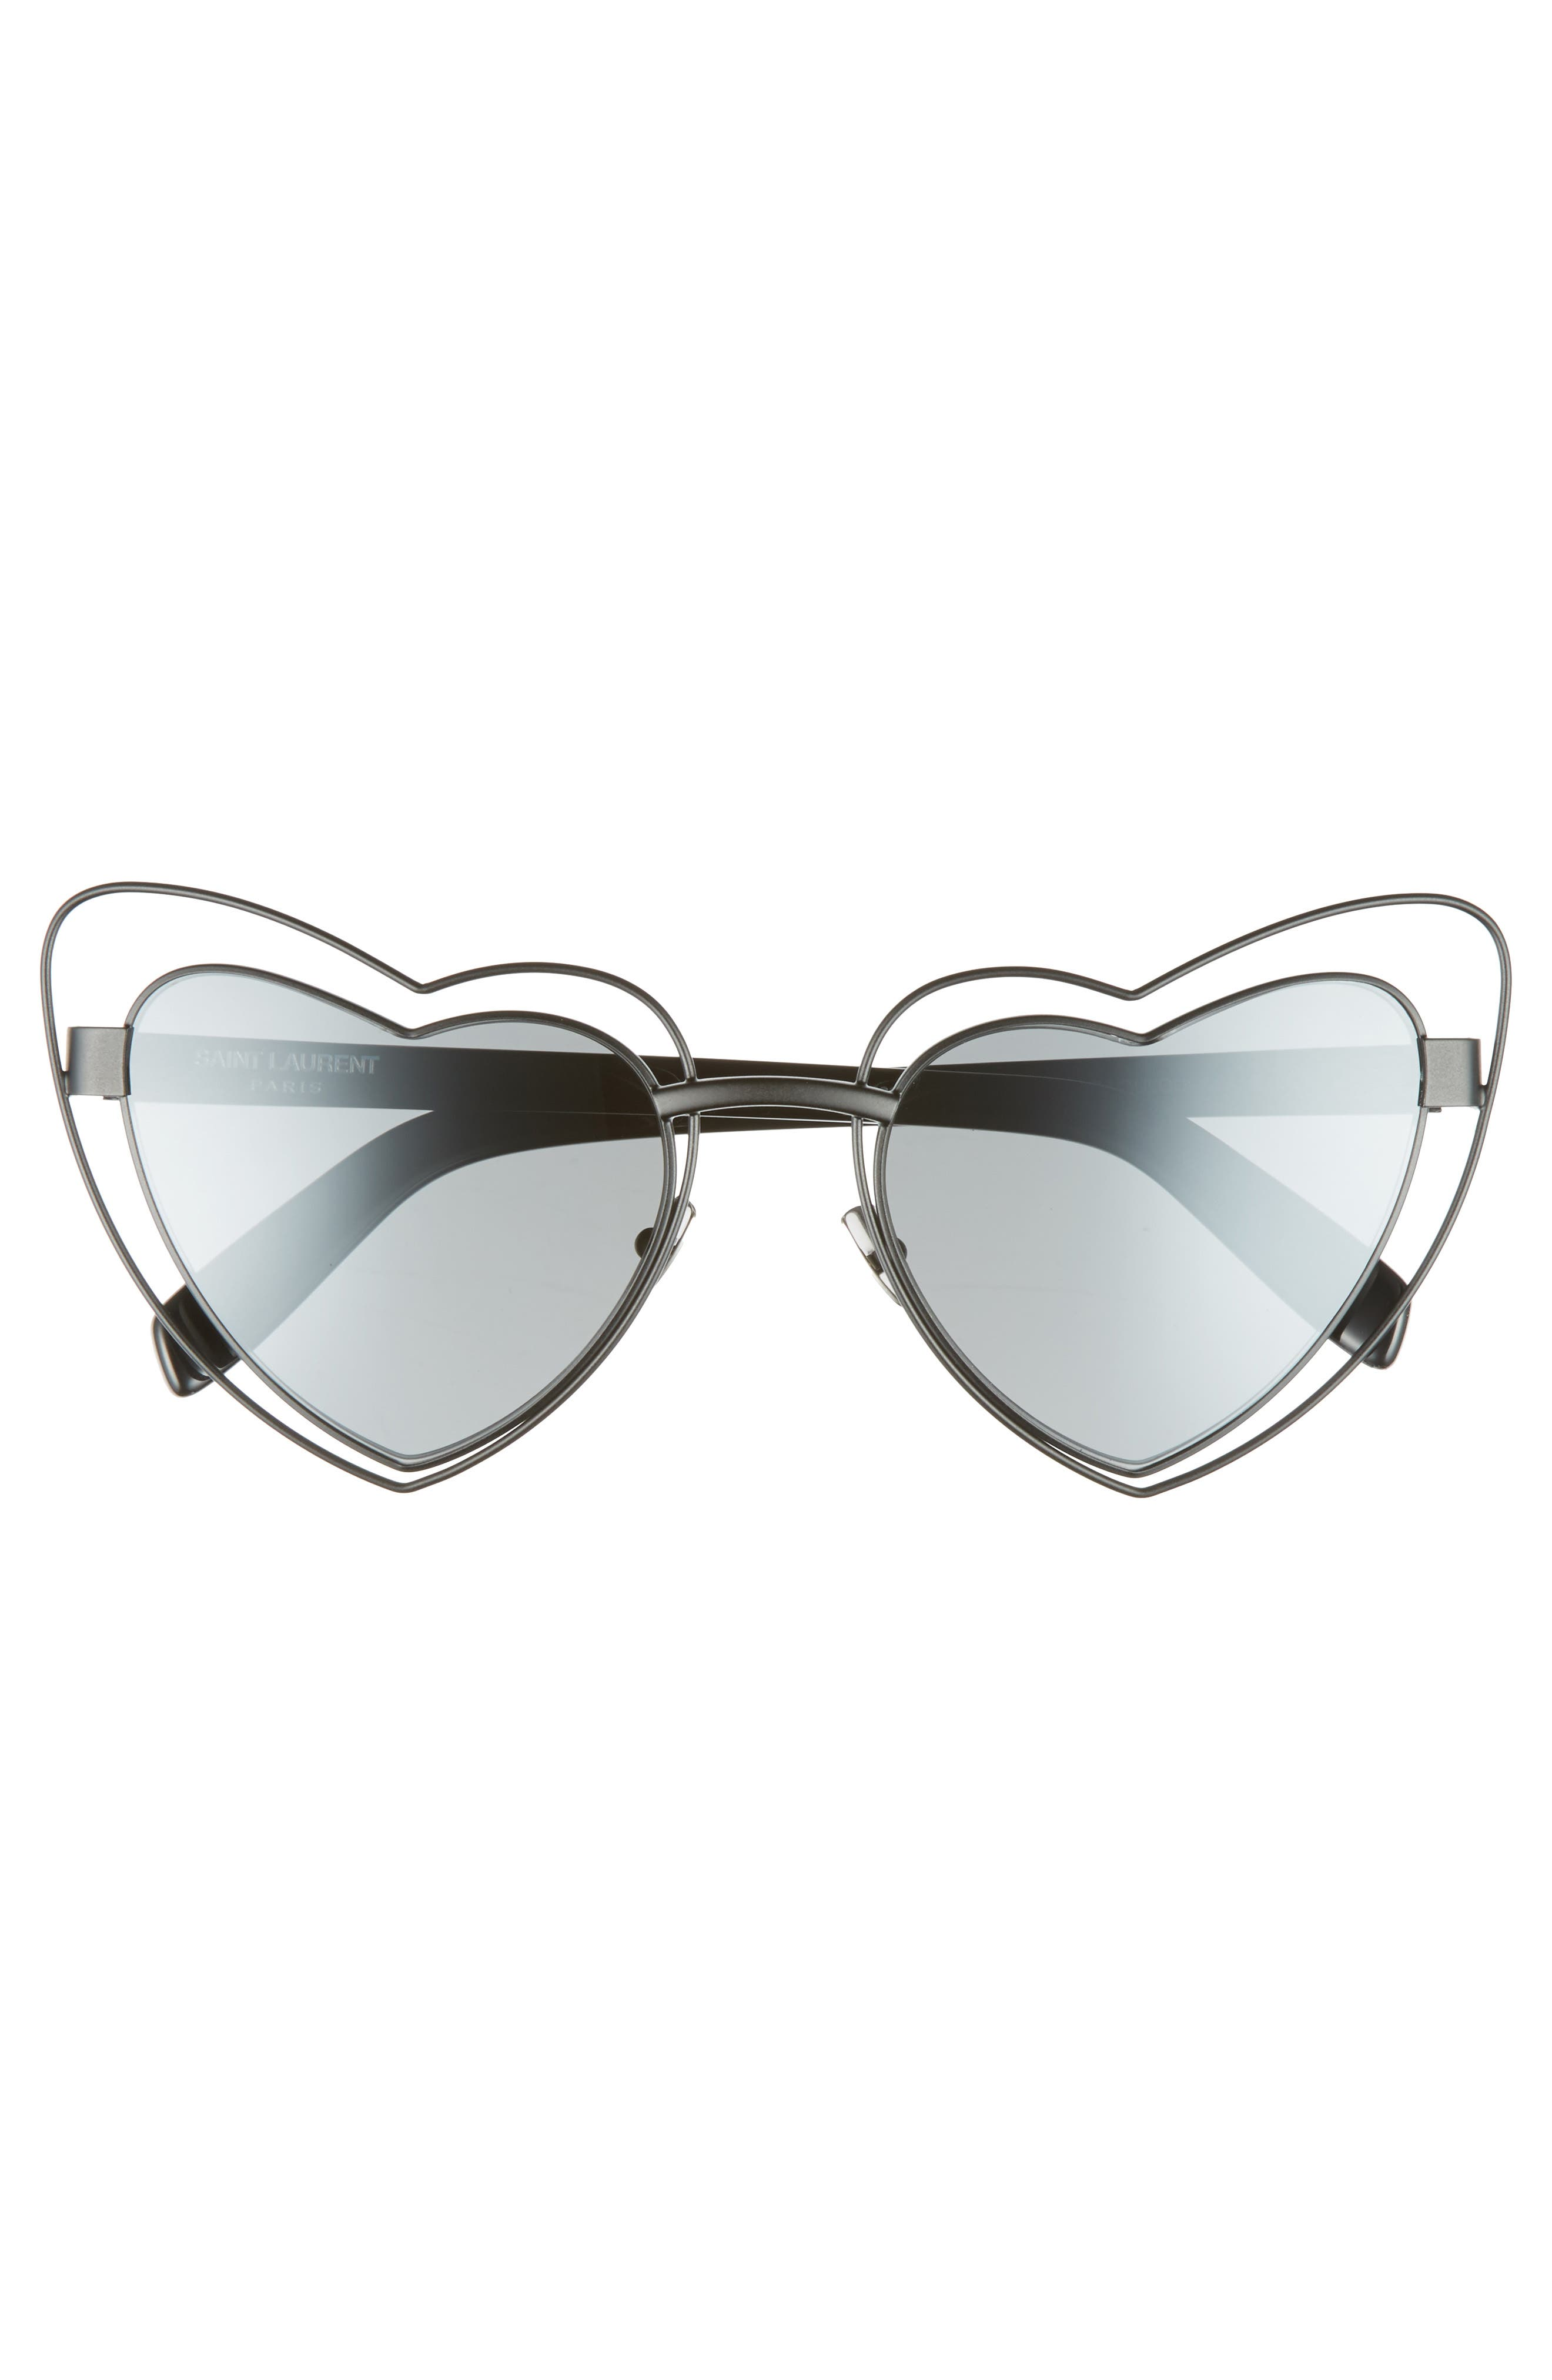 SL197 Loulou 57mm Heart Shaped Sunglasses,                             Alternate thumbnail 3, color,                             001